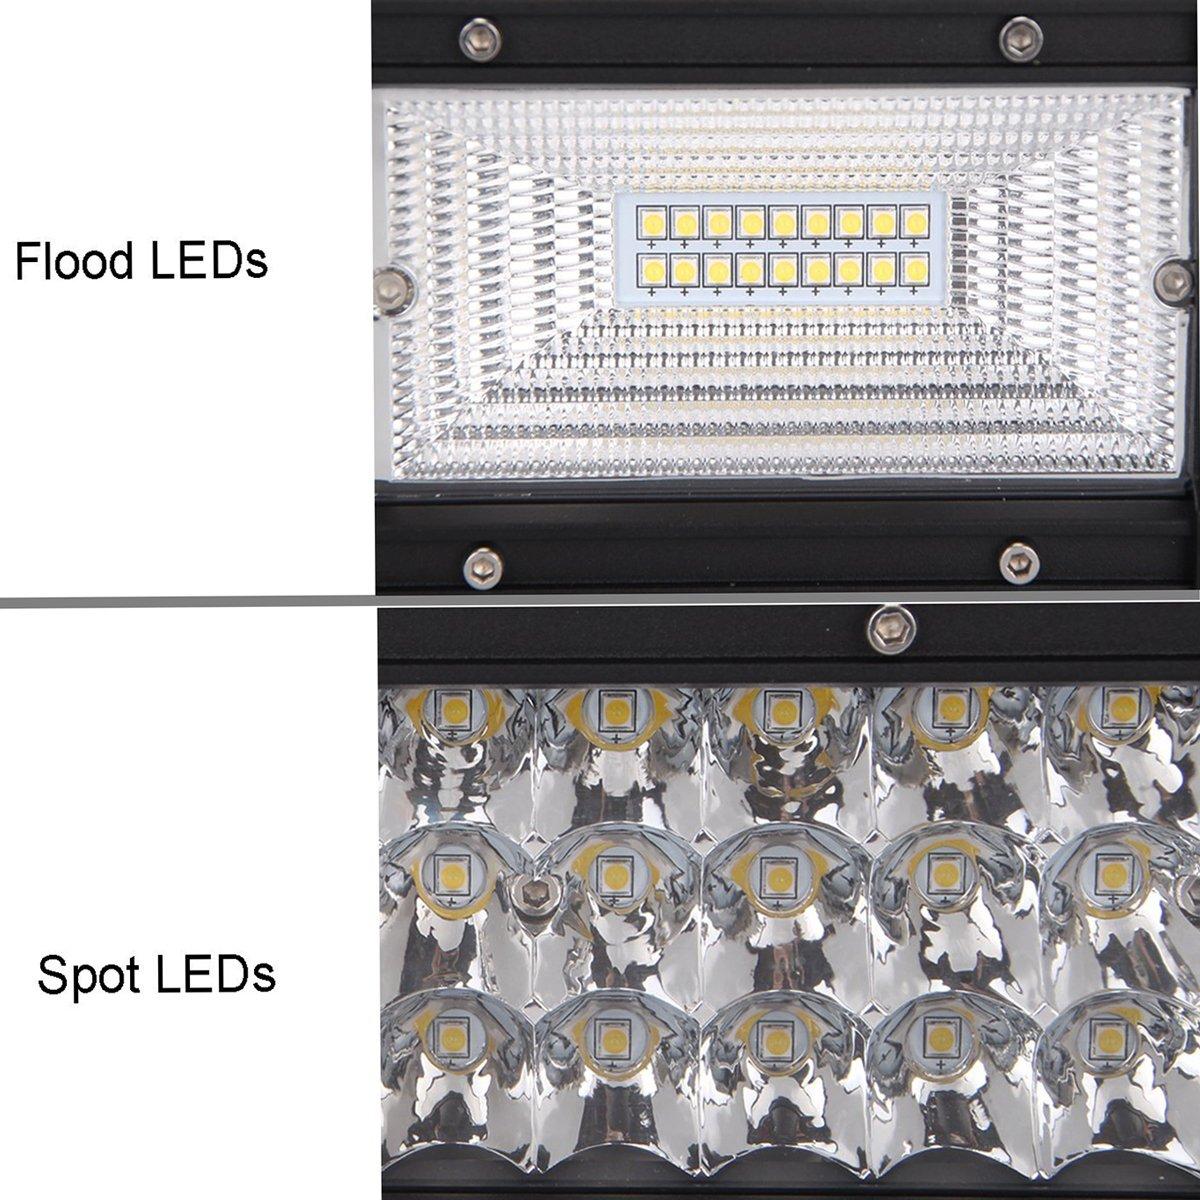 Auxtings 22 inch 270 W Triple rang/ée 7d Barre lumineuse LED de travail spot inondation Combo Faisceau DC 12 V-24 V 6000 K Offroad V/éhicules 4 x 4 ATV Utvs